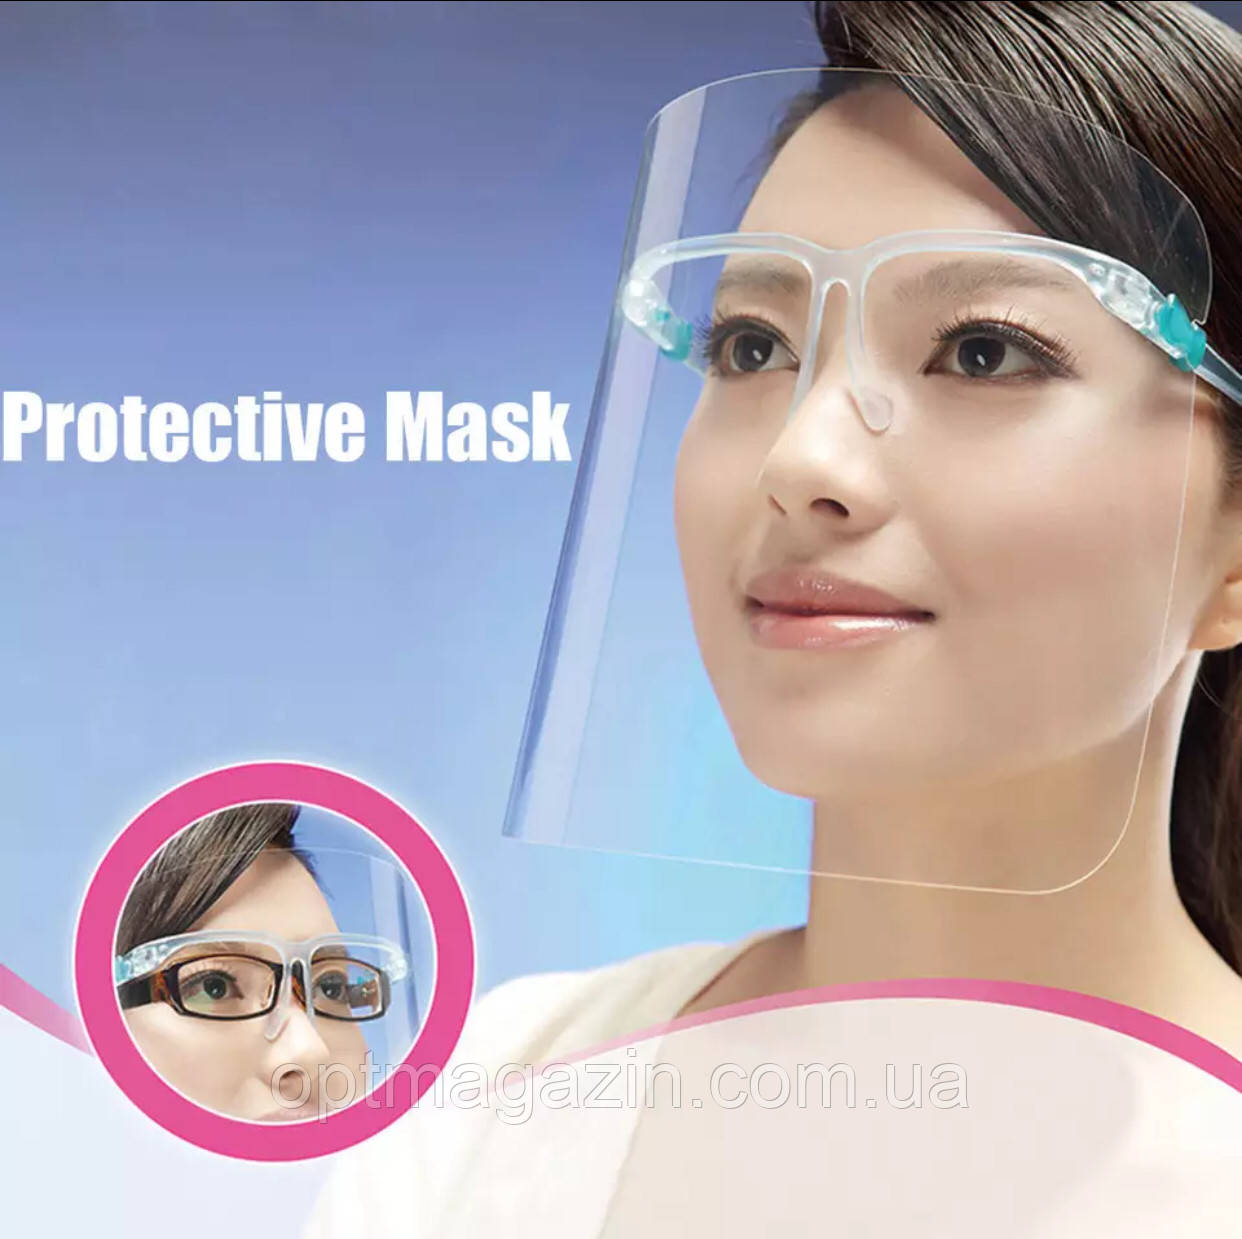 Маска захисна від вірусу прозора Face Shield Glasses (минимальный заказ 5 шт)